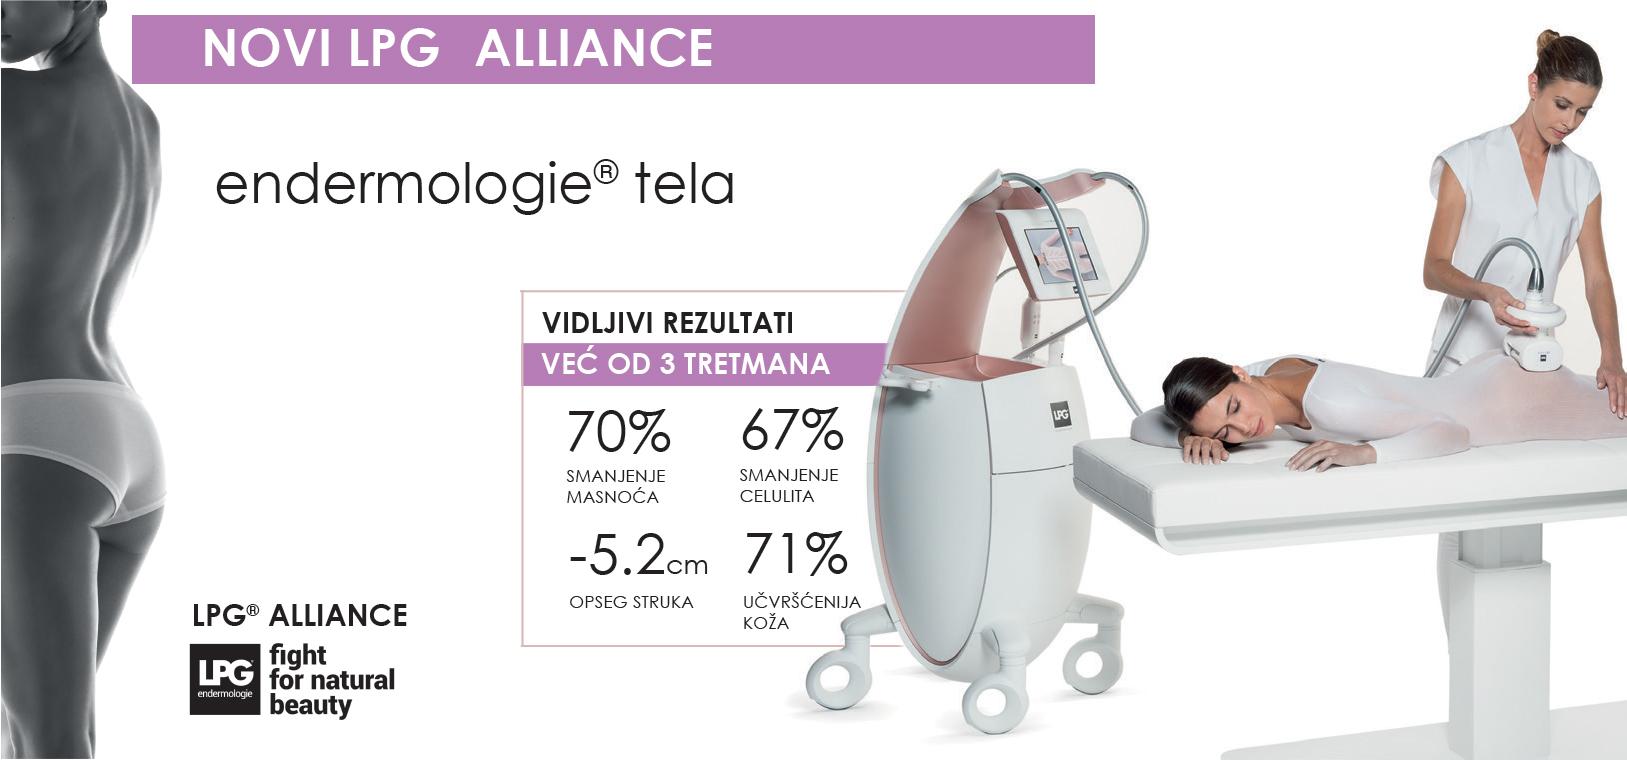 lpg alliance tretman uklanjanja celulita Beograd